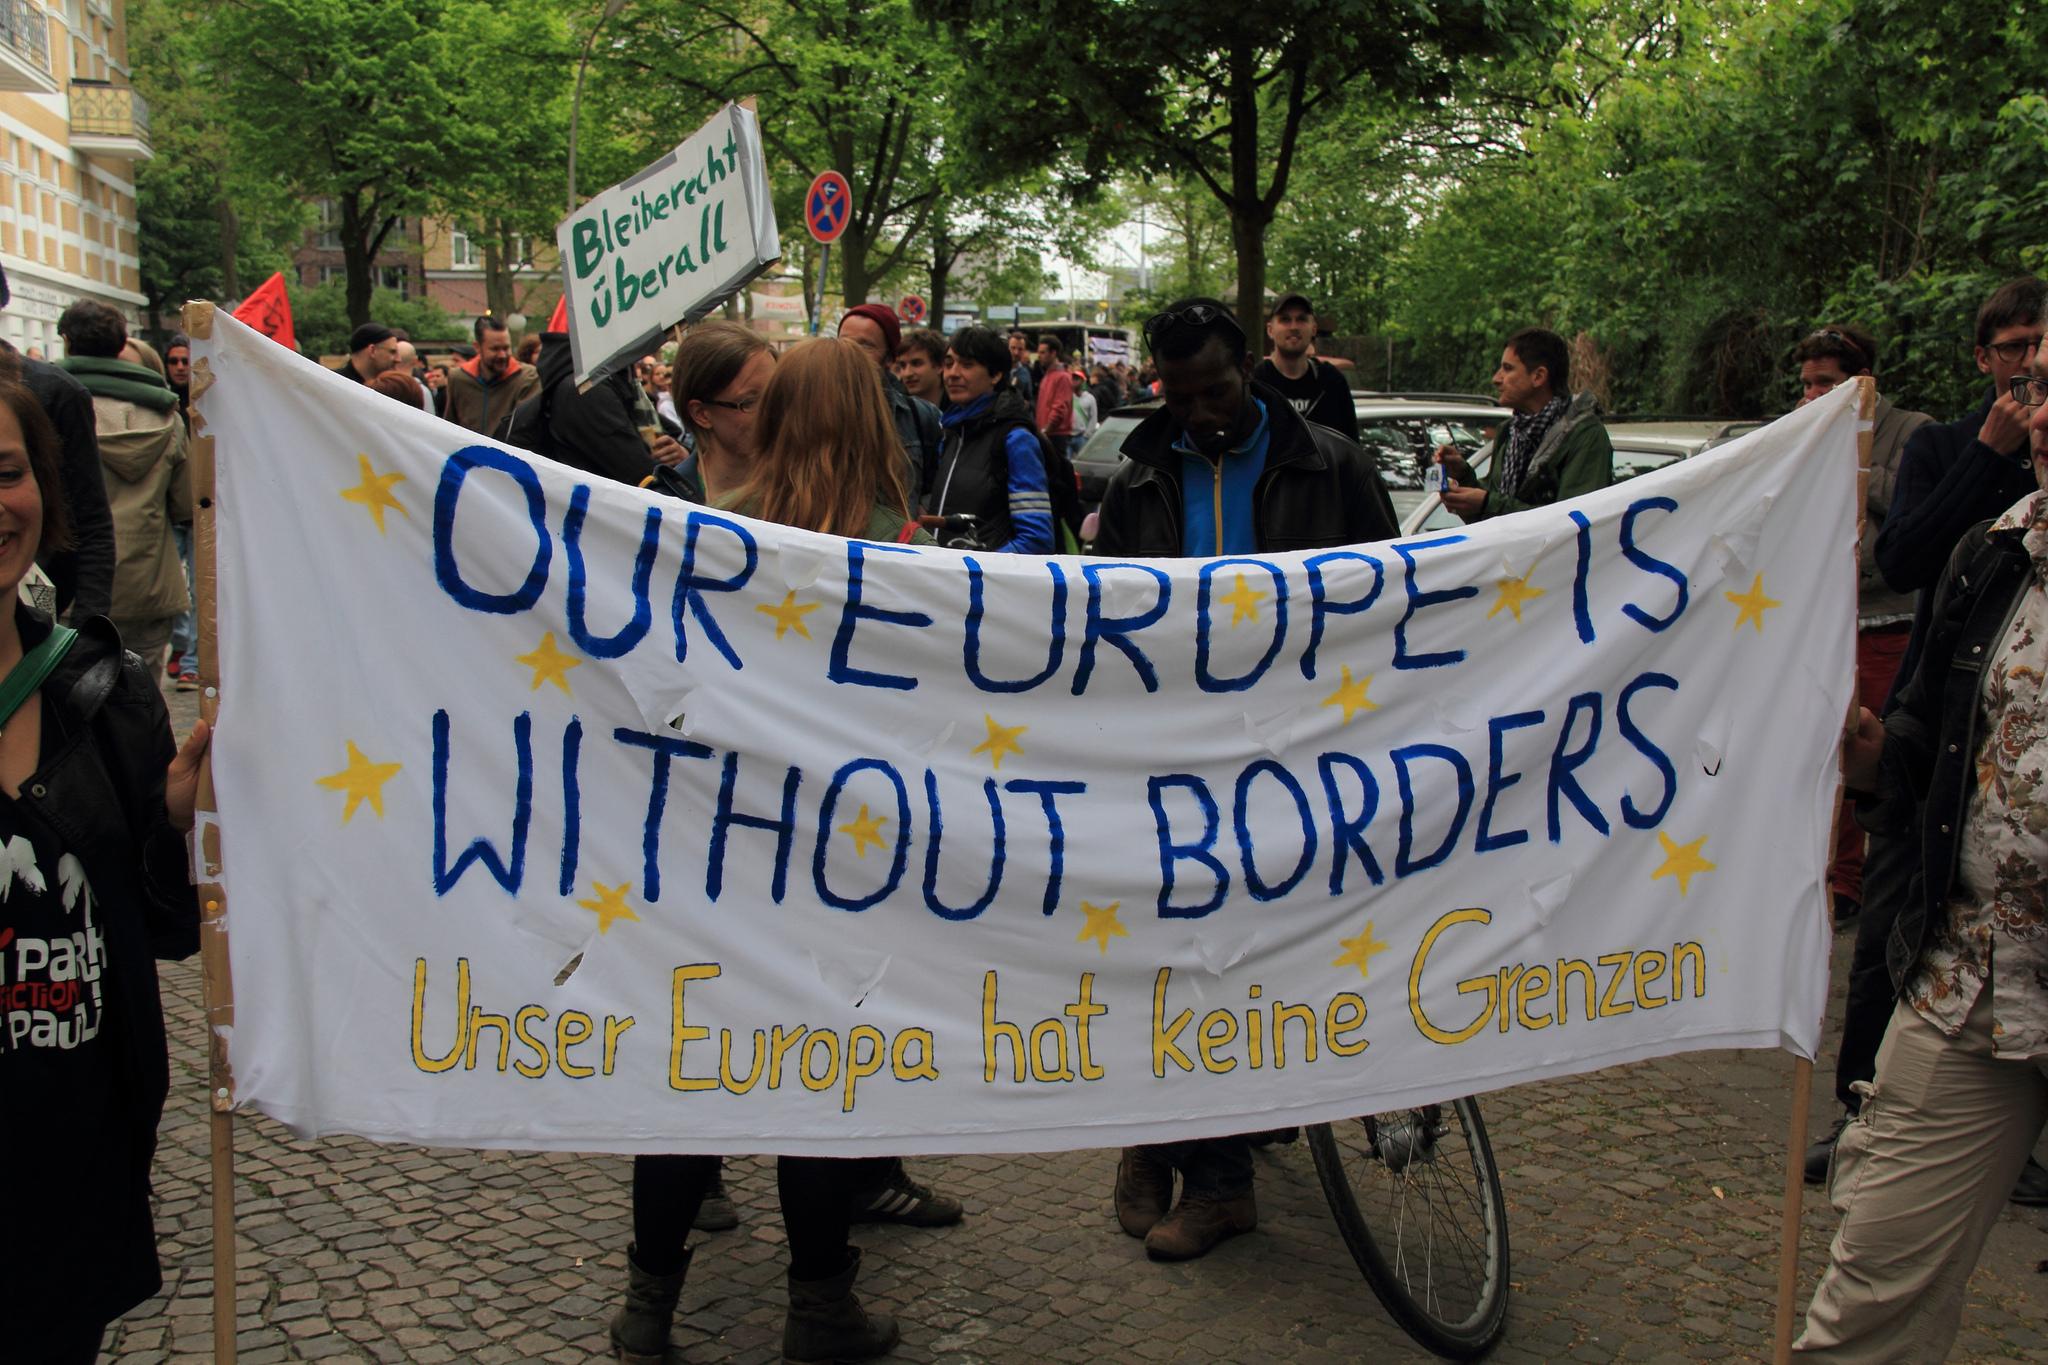 Refugee welcome centre in Hamburg, Germany. May 2014 [Rasande Tyskar/Flickr]